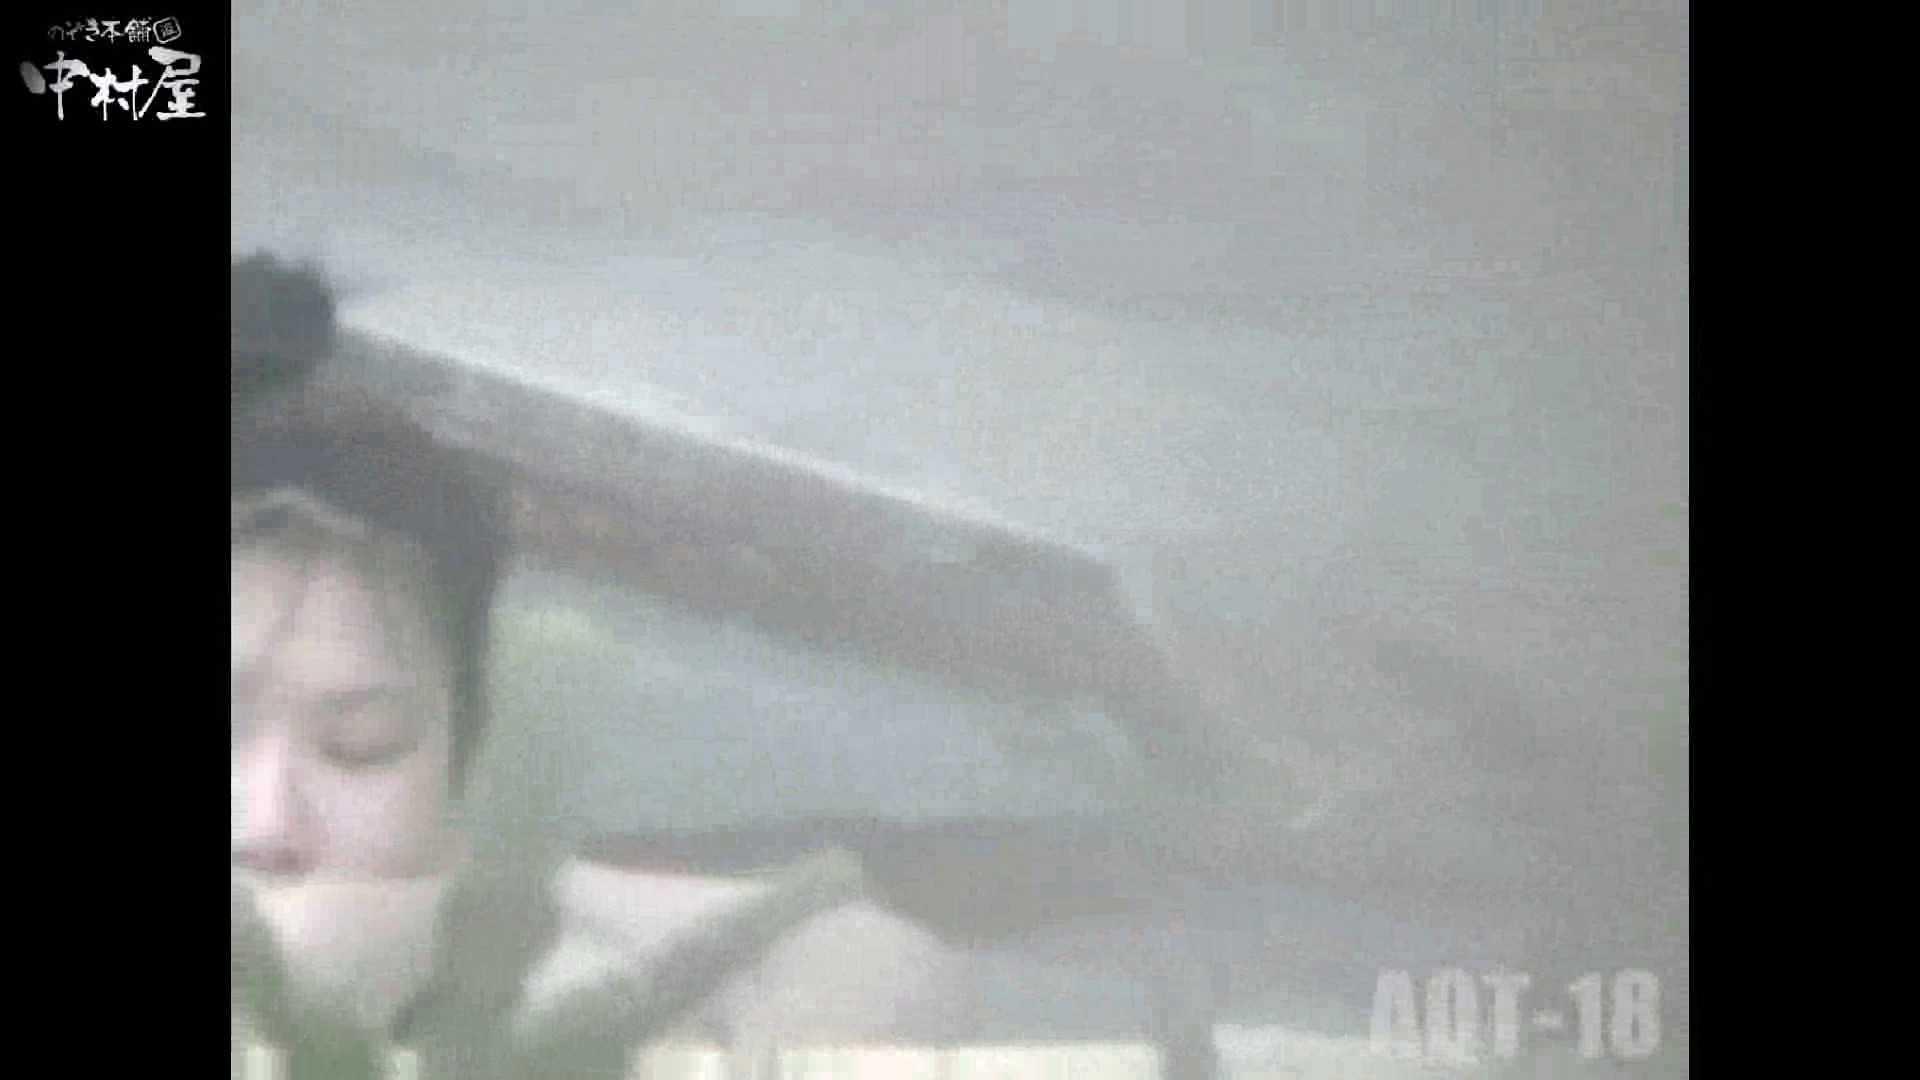 Aquaな露天風呂Vol.882潜入盗撮露天風呂十八判湯 其の二 露天  78PICs 16